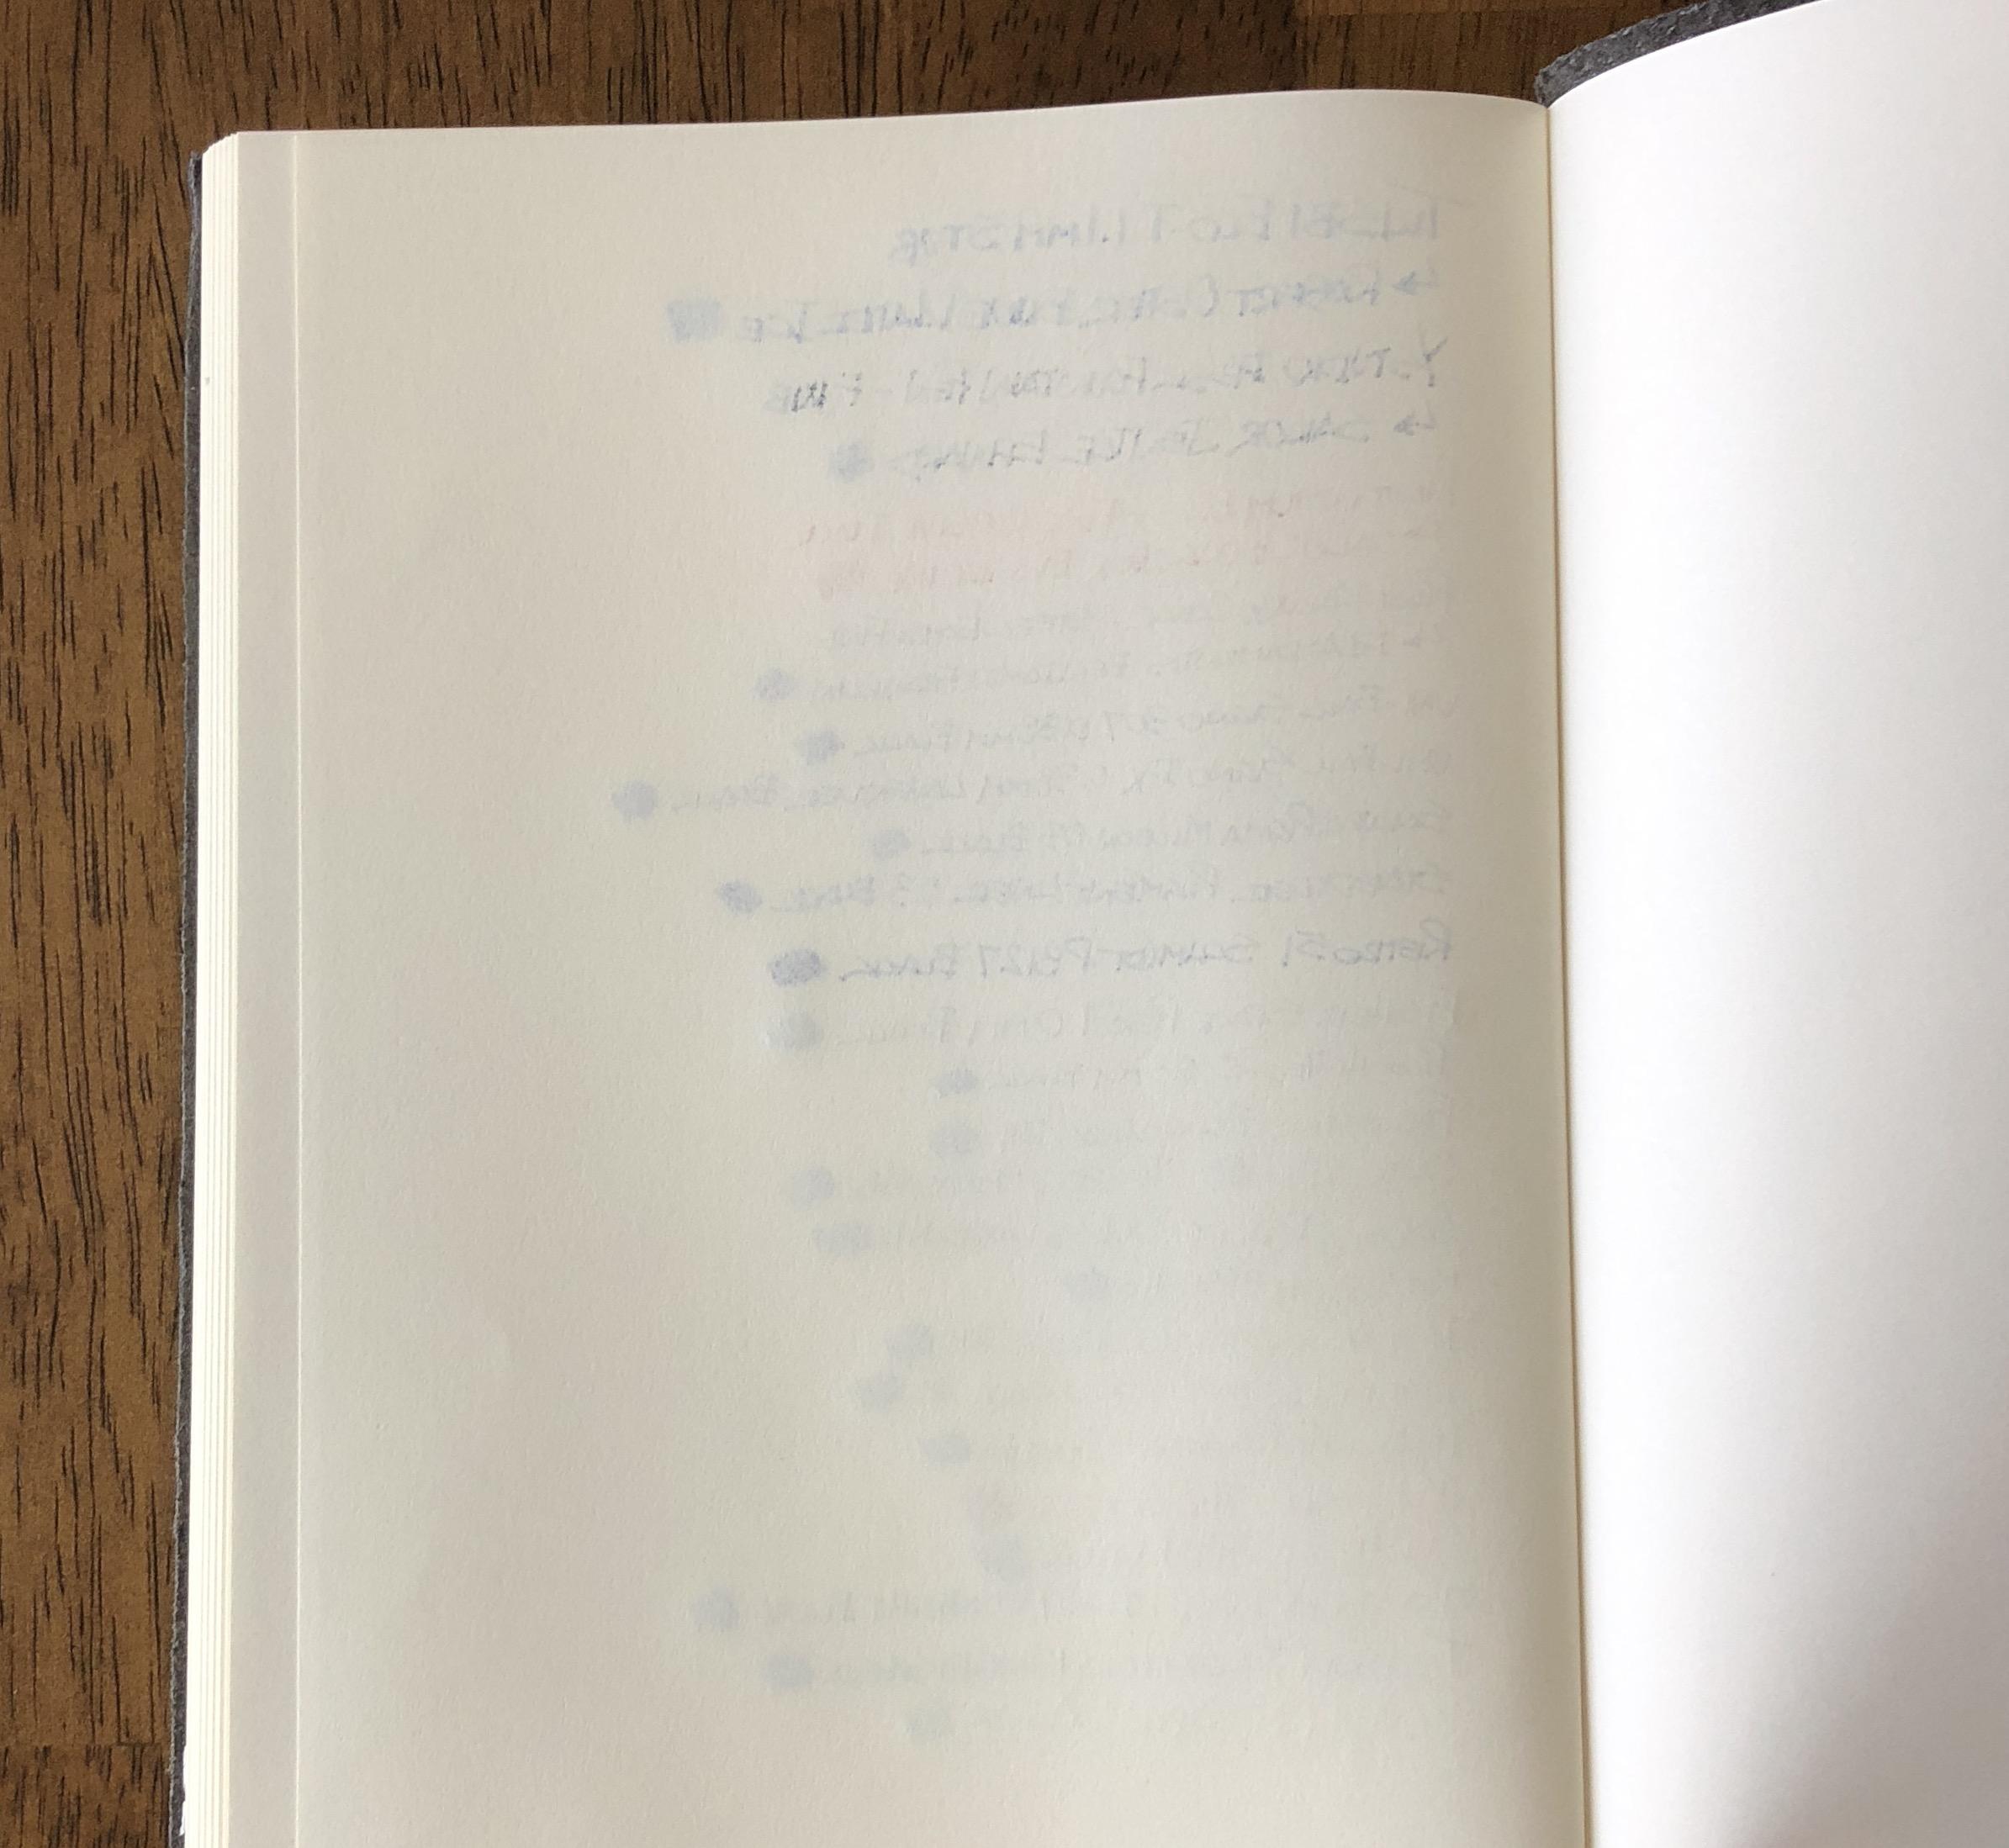 Centralcrafts Capri Journal Writing Back